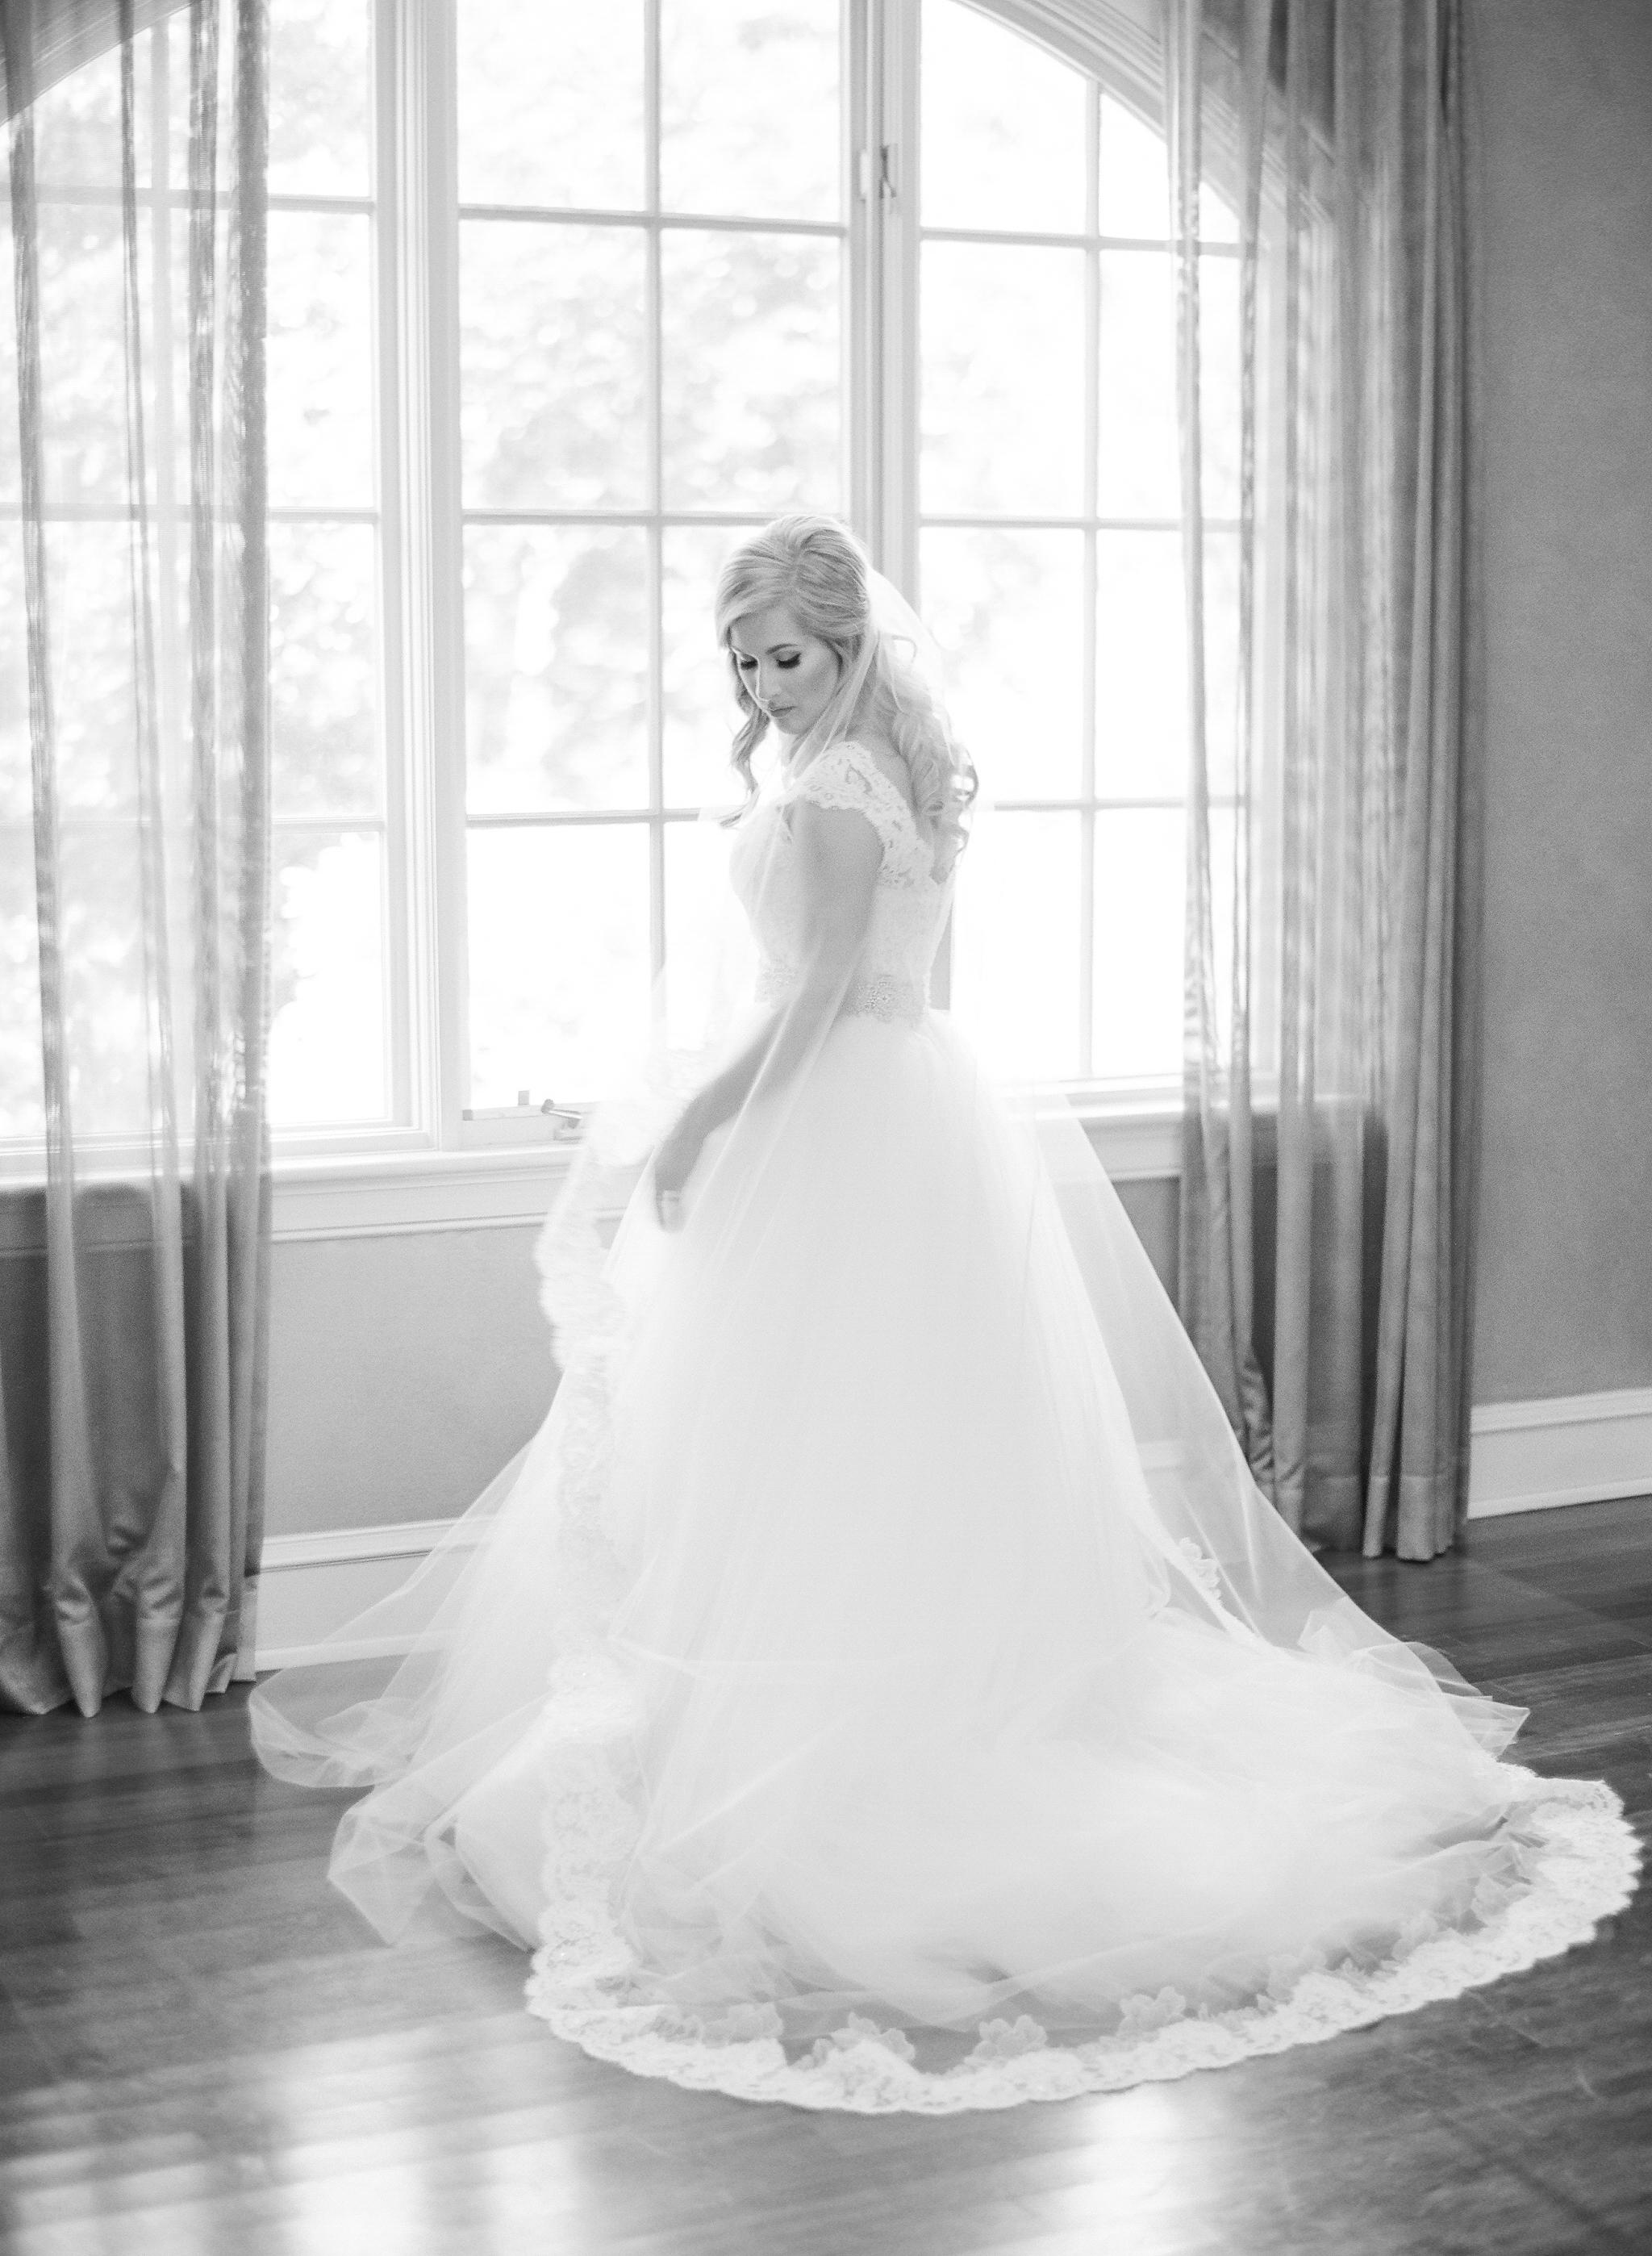 Ceci_New_York_Florida_Wedding_Style_Bride_Watercolor_Real_Custom_Luxury_4.jpg